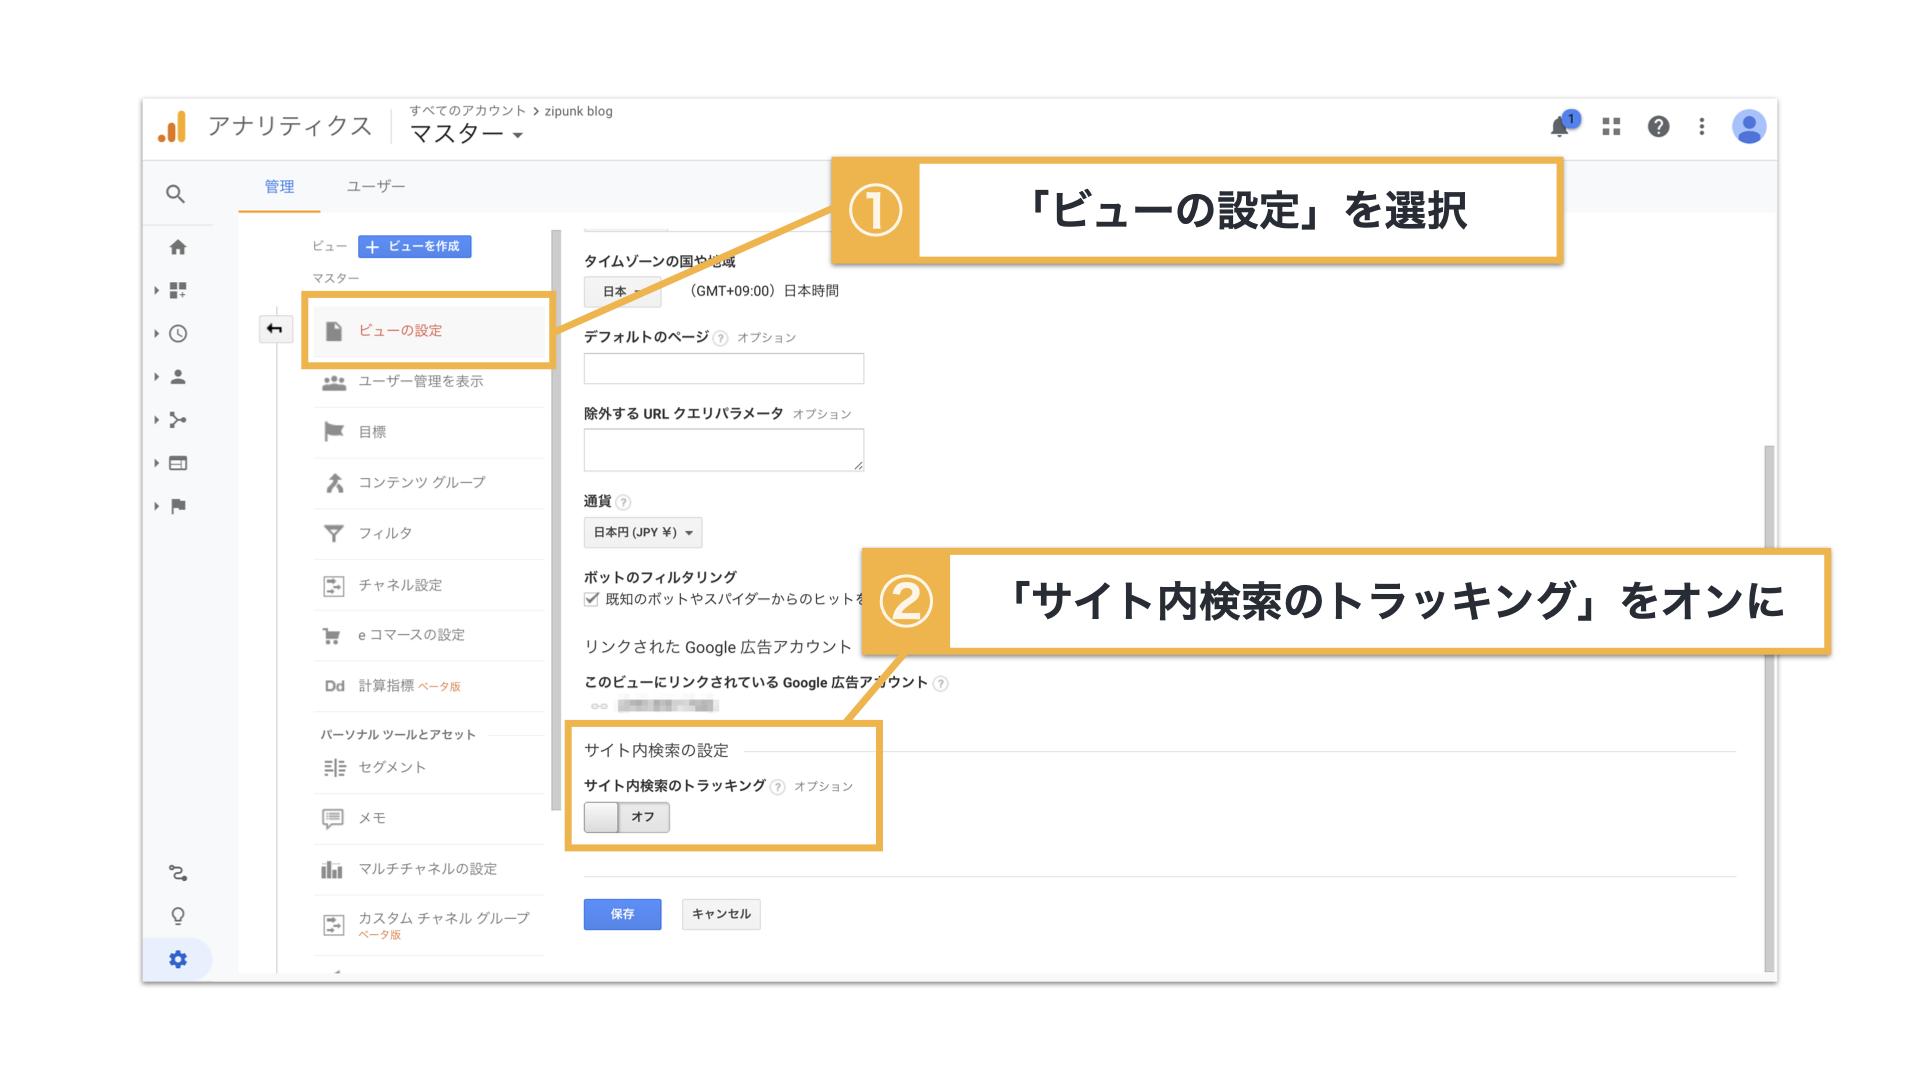 ga-site-search-setting-1